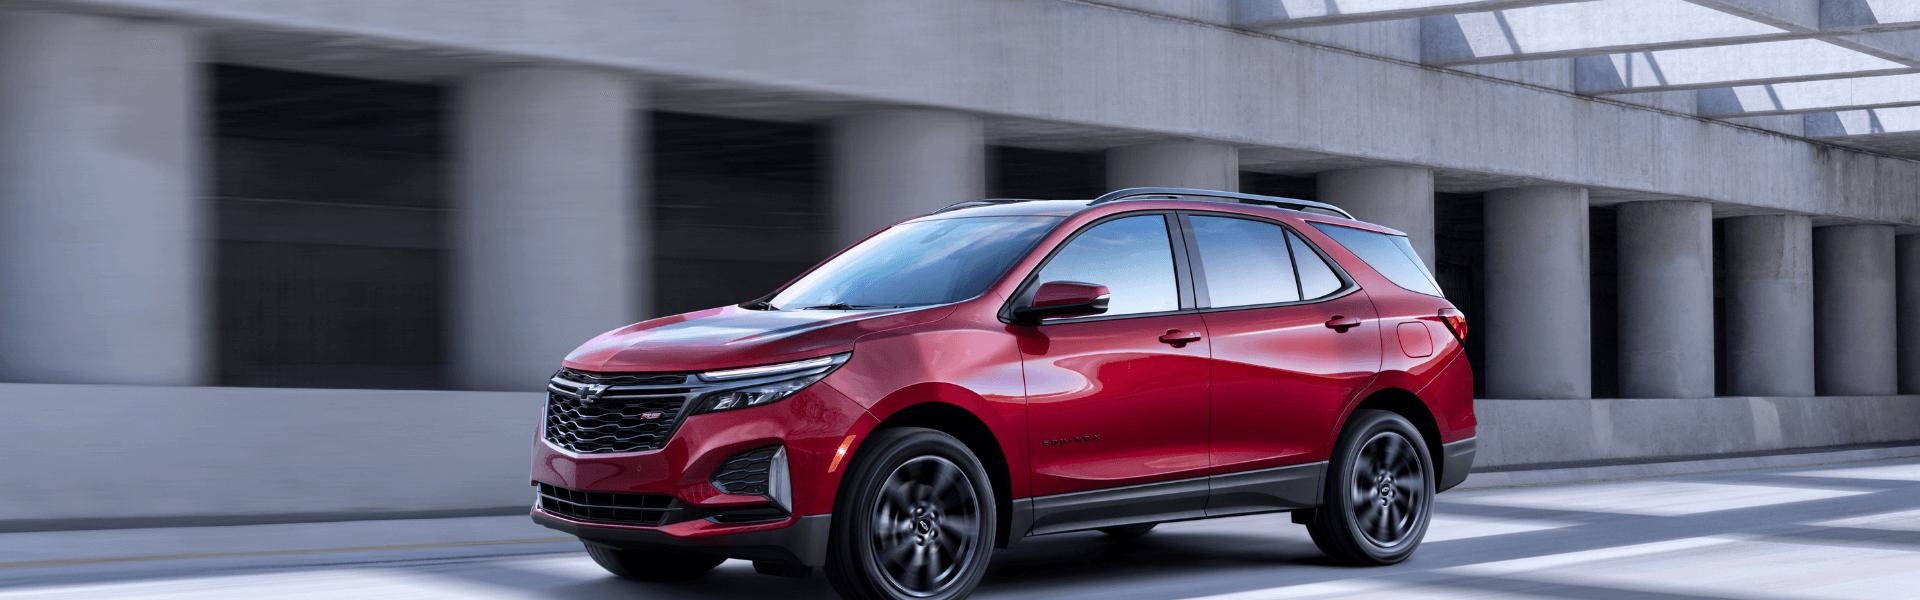 2022 Chevrolet Equinox